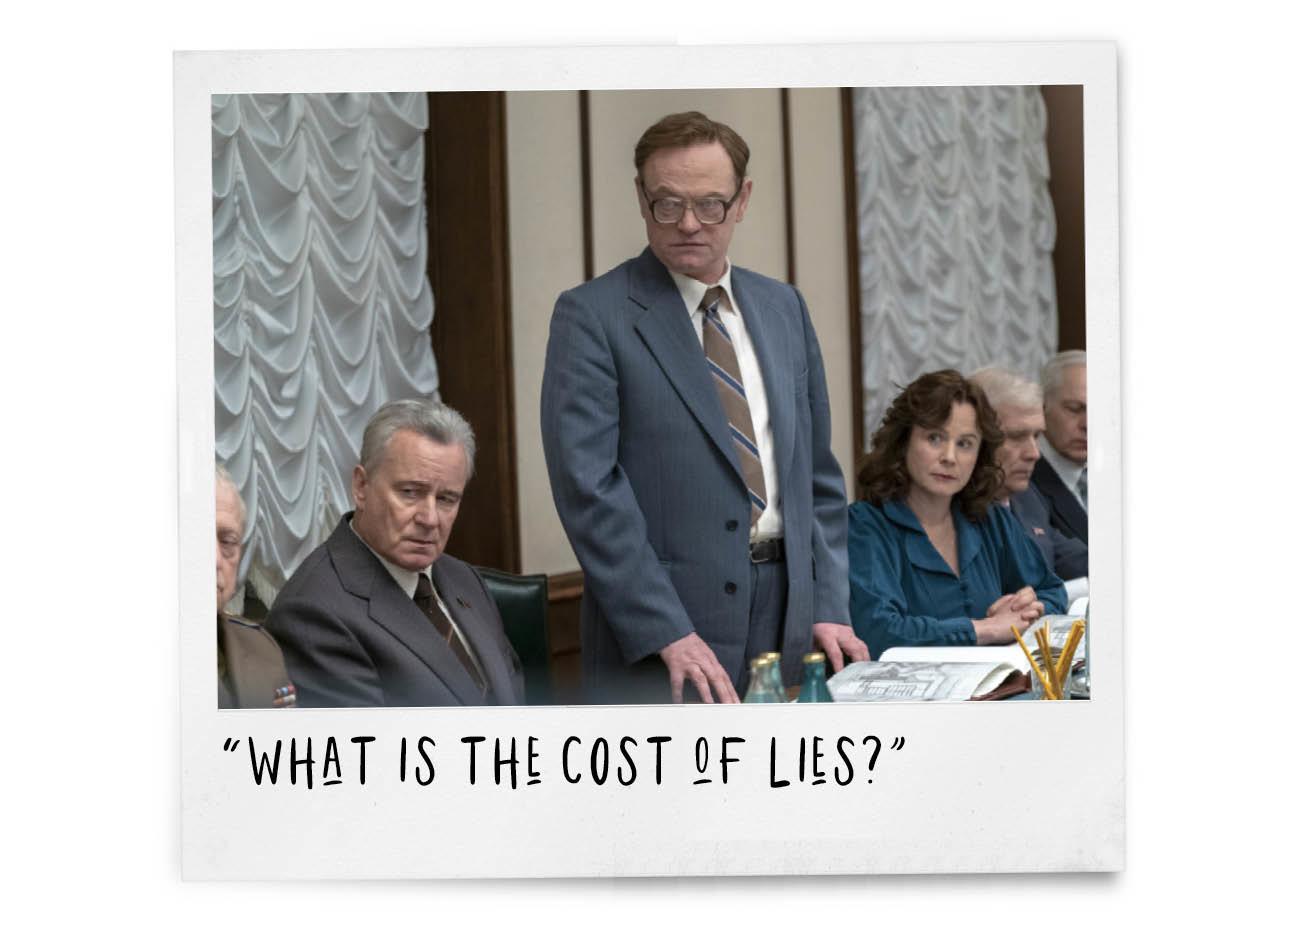 vergadering, man in pak met bril, beeld uit de nieuwe hbo serie chernobyl